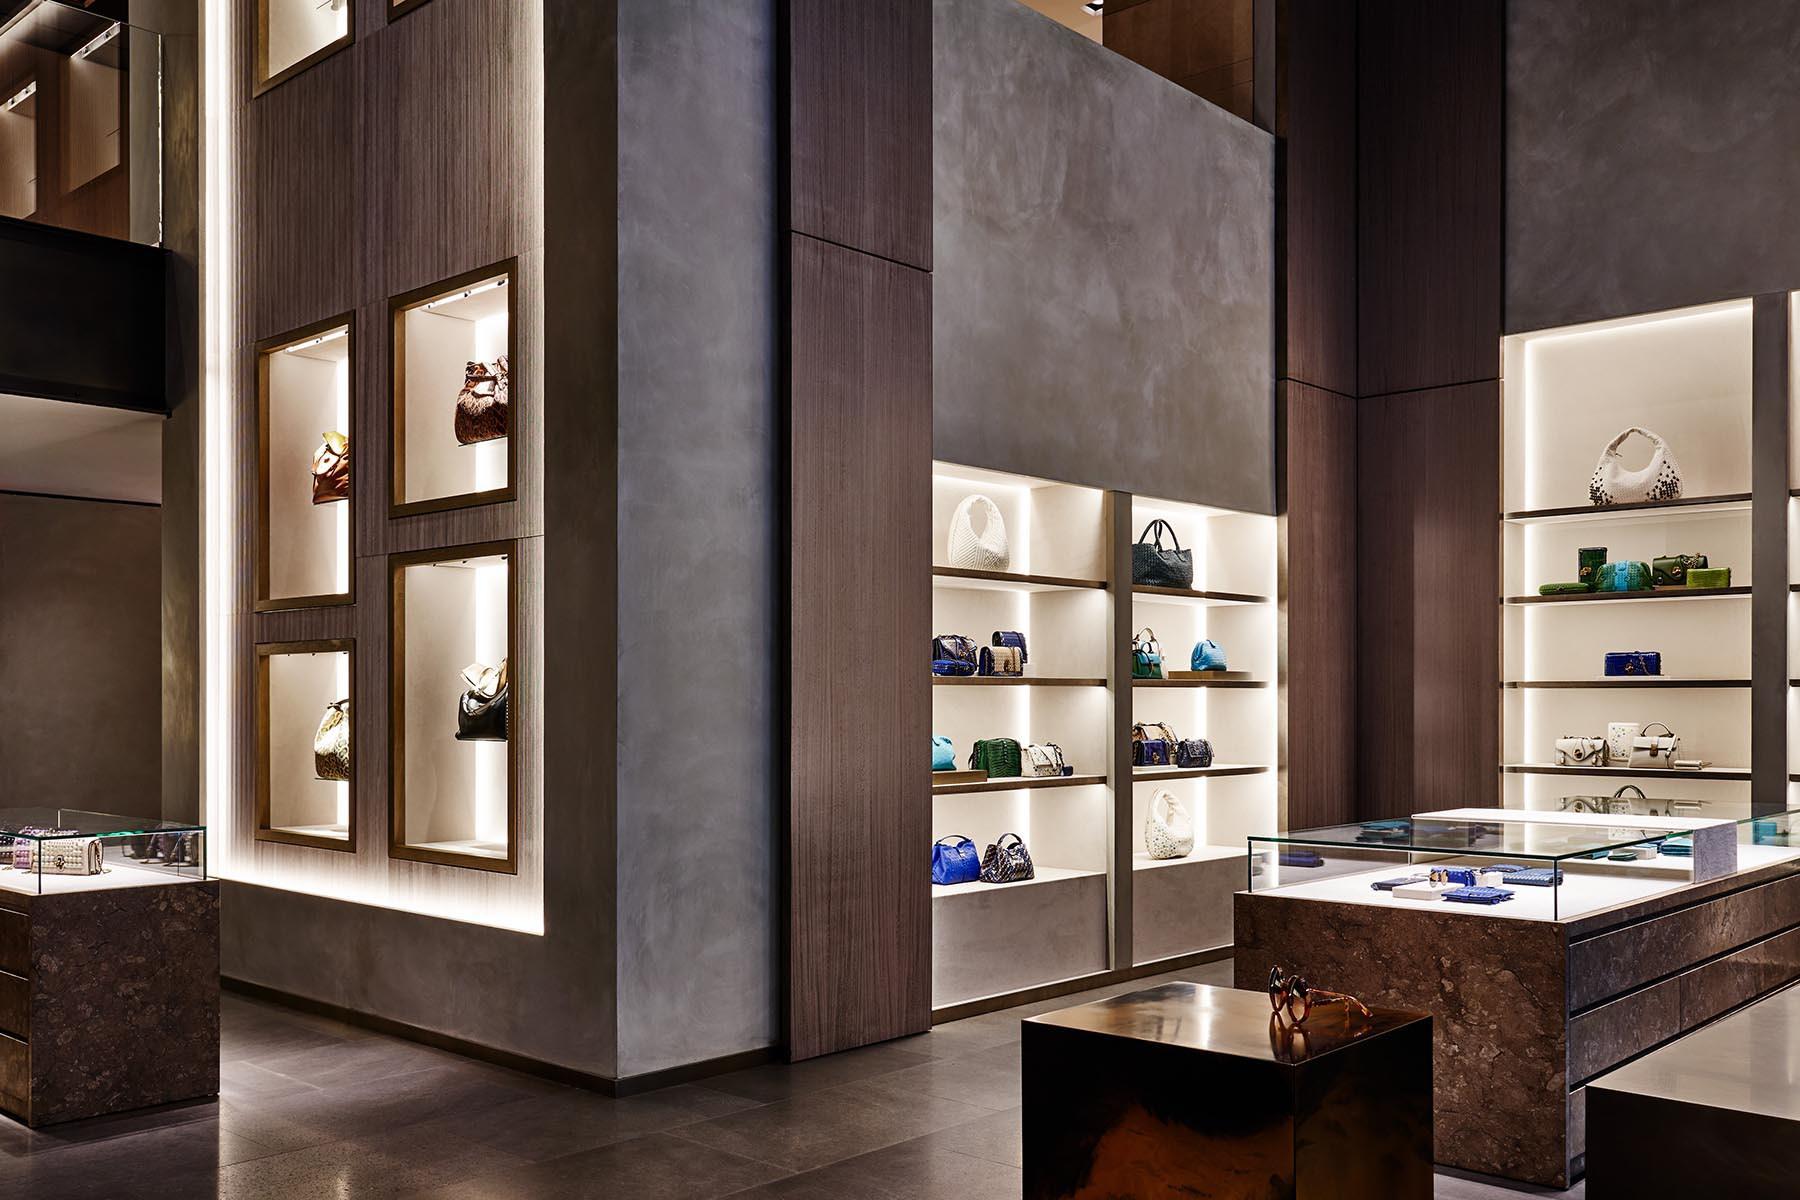 Bottega Veneta Opens a 5-Story Flagship on Madison Avenue ...